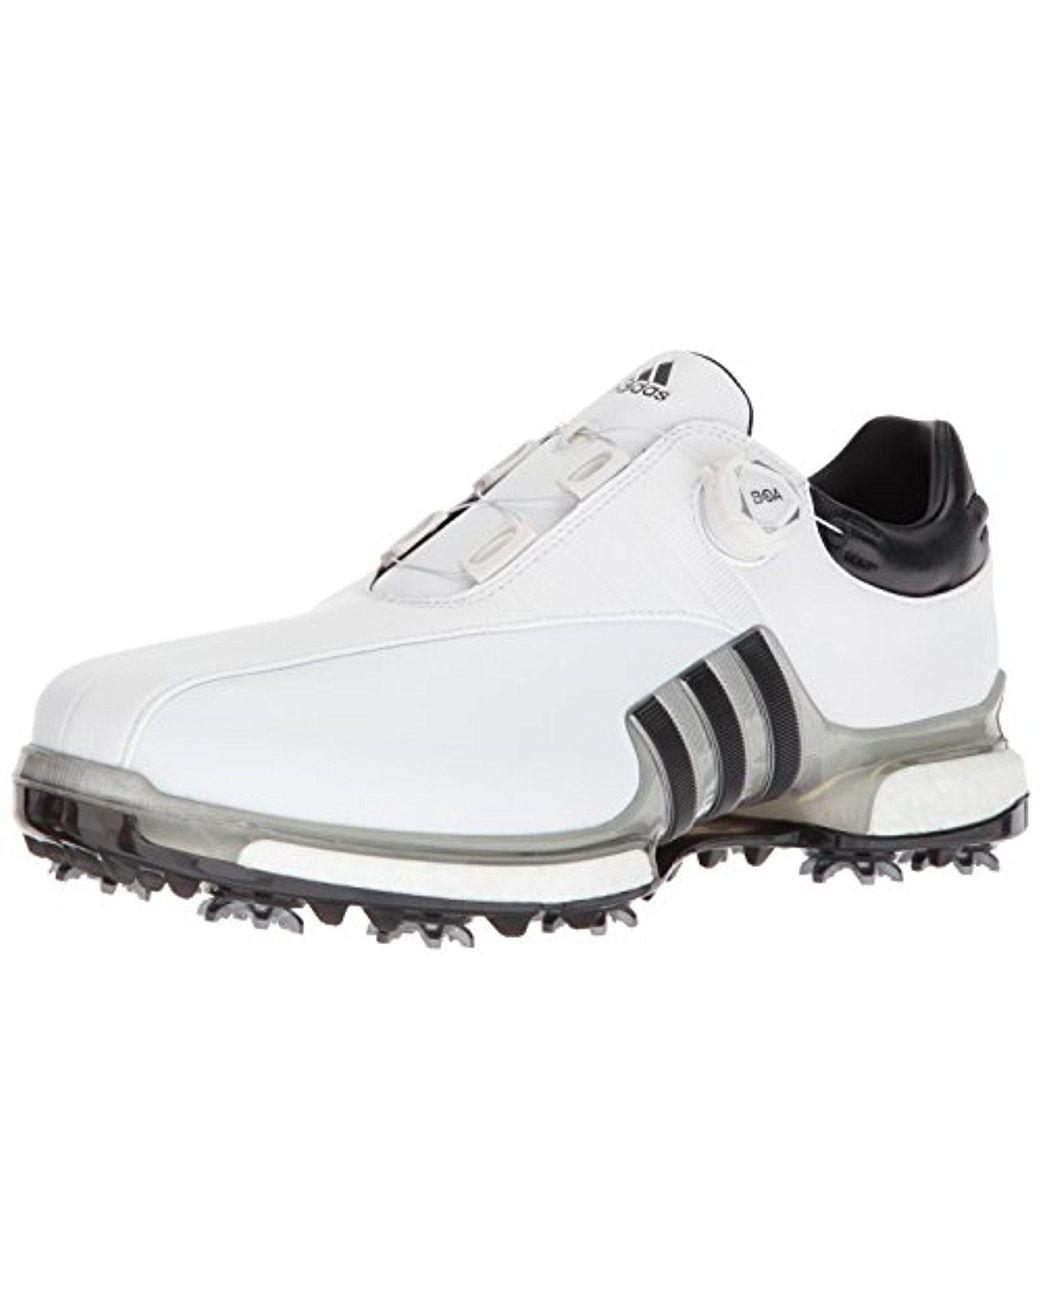 san francisco 809ce bf530 Men's White Tour360 Eqt Boa Golf Shoe